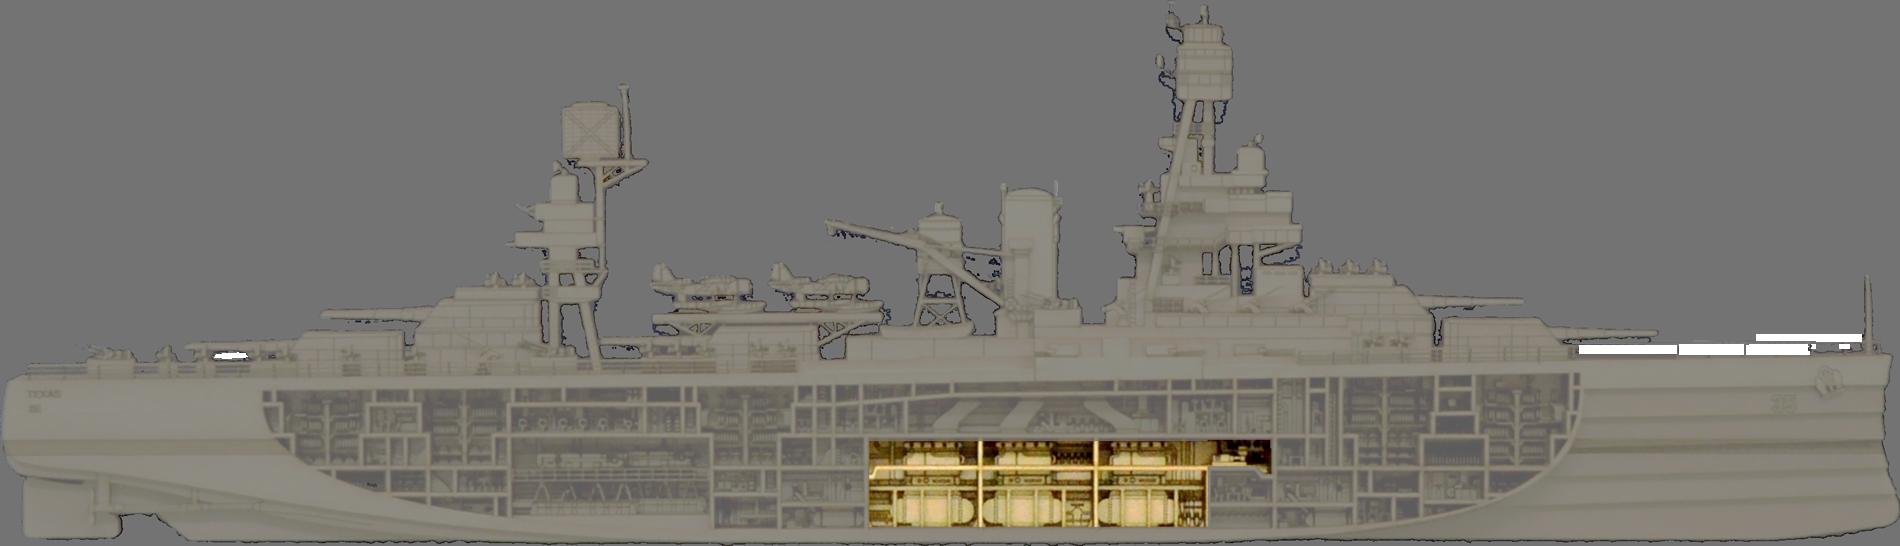 banner library stock The texas foundation . Battleship clipart naval ship.